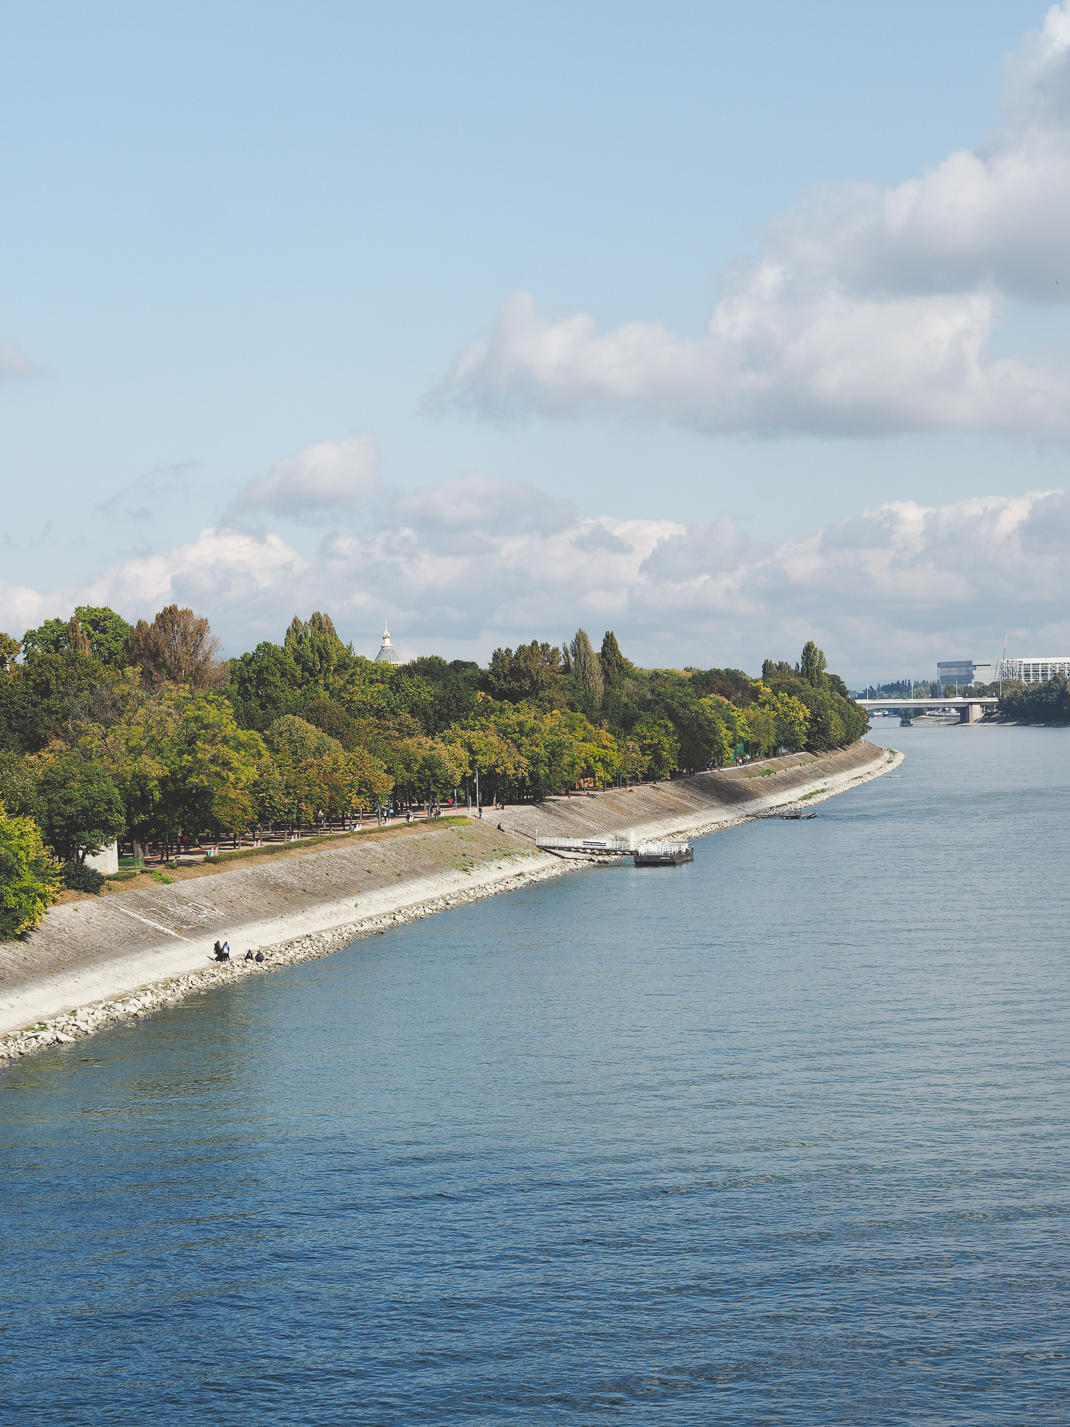 budapest margaret's island